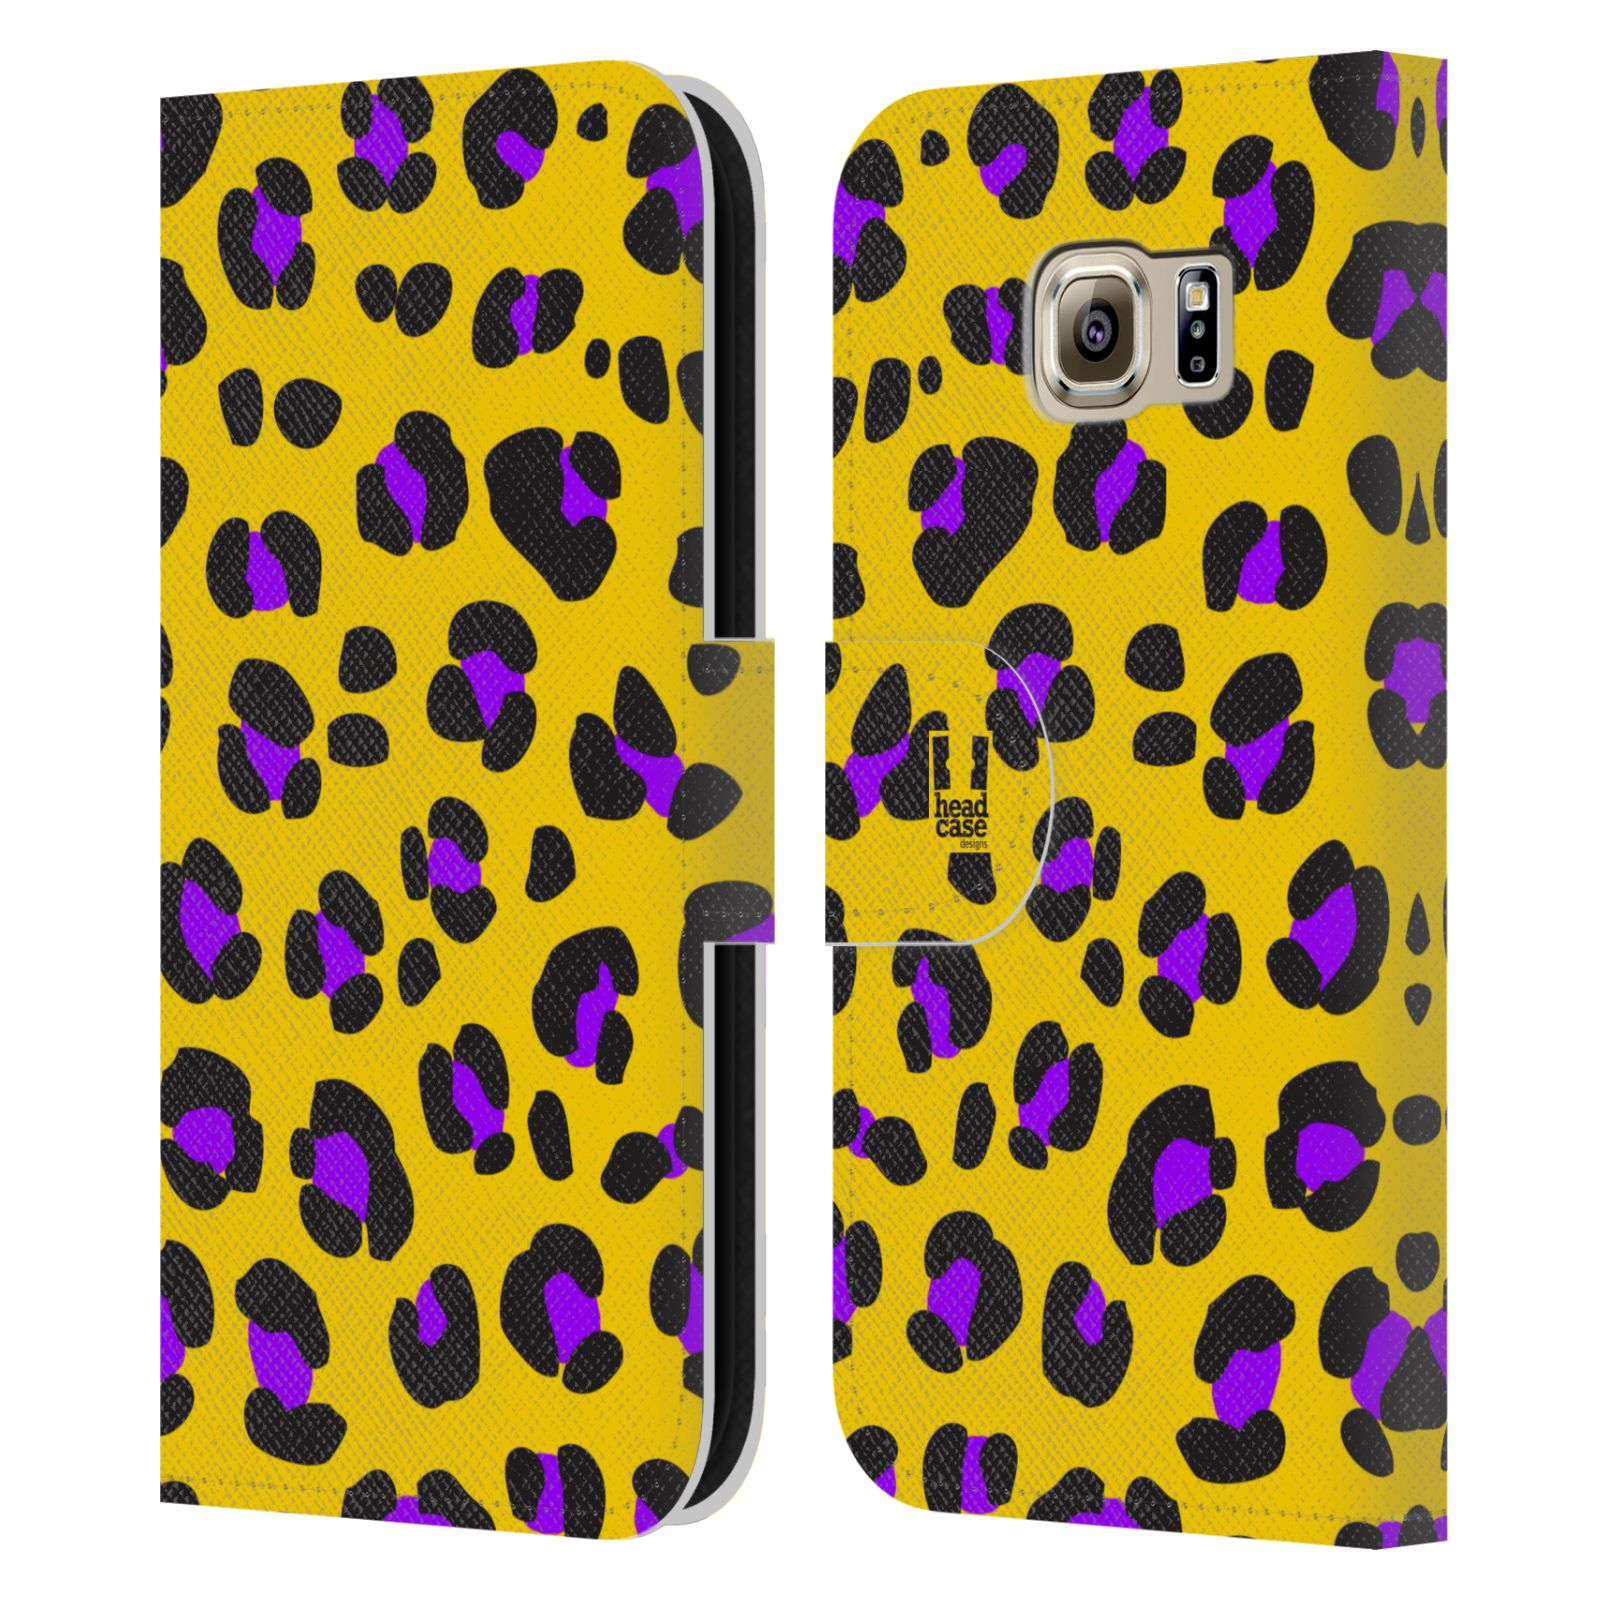 HEAD CASE Flipové pouzdro pro mobil Samsung Galaxy S6 (G9200) Zvířecí barevné vzory žlutý leopard fialové skvrny